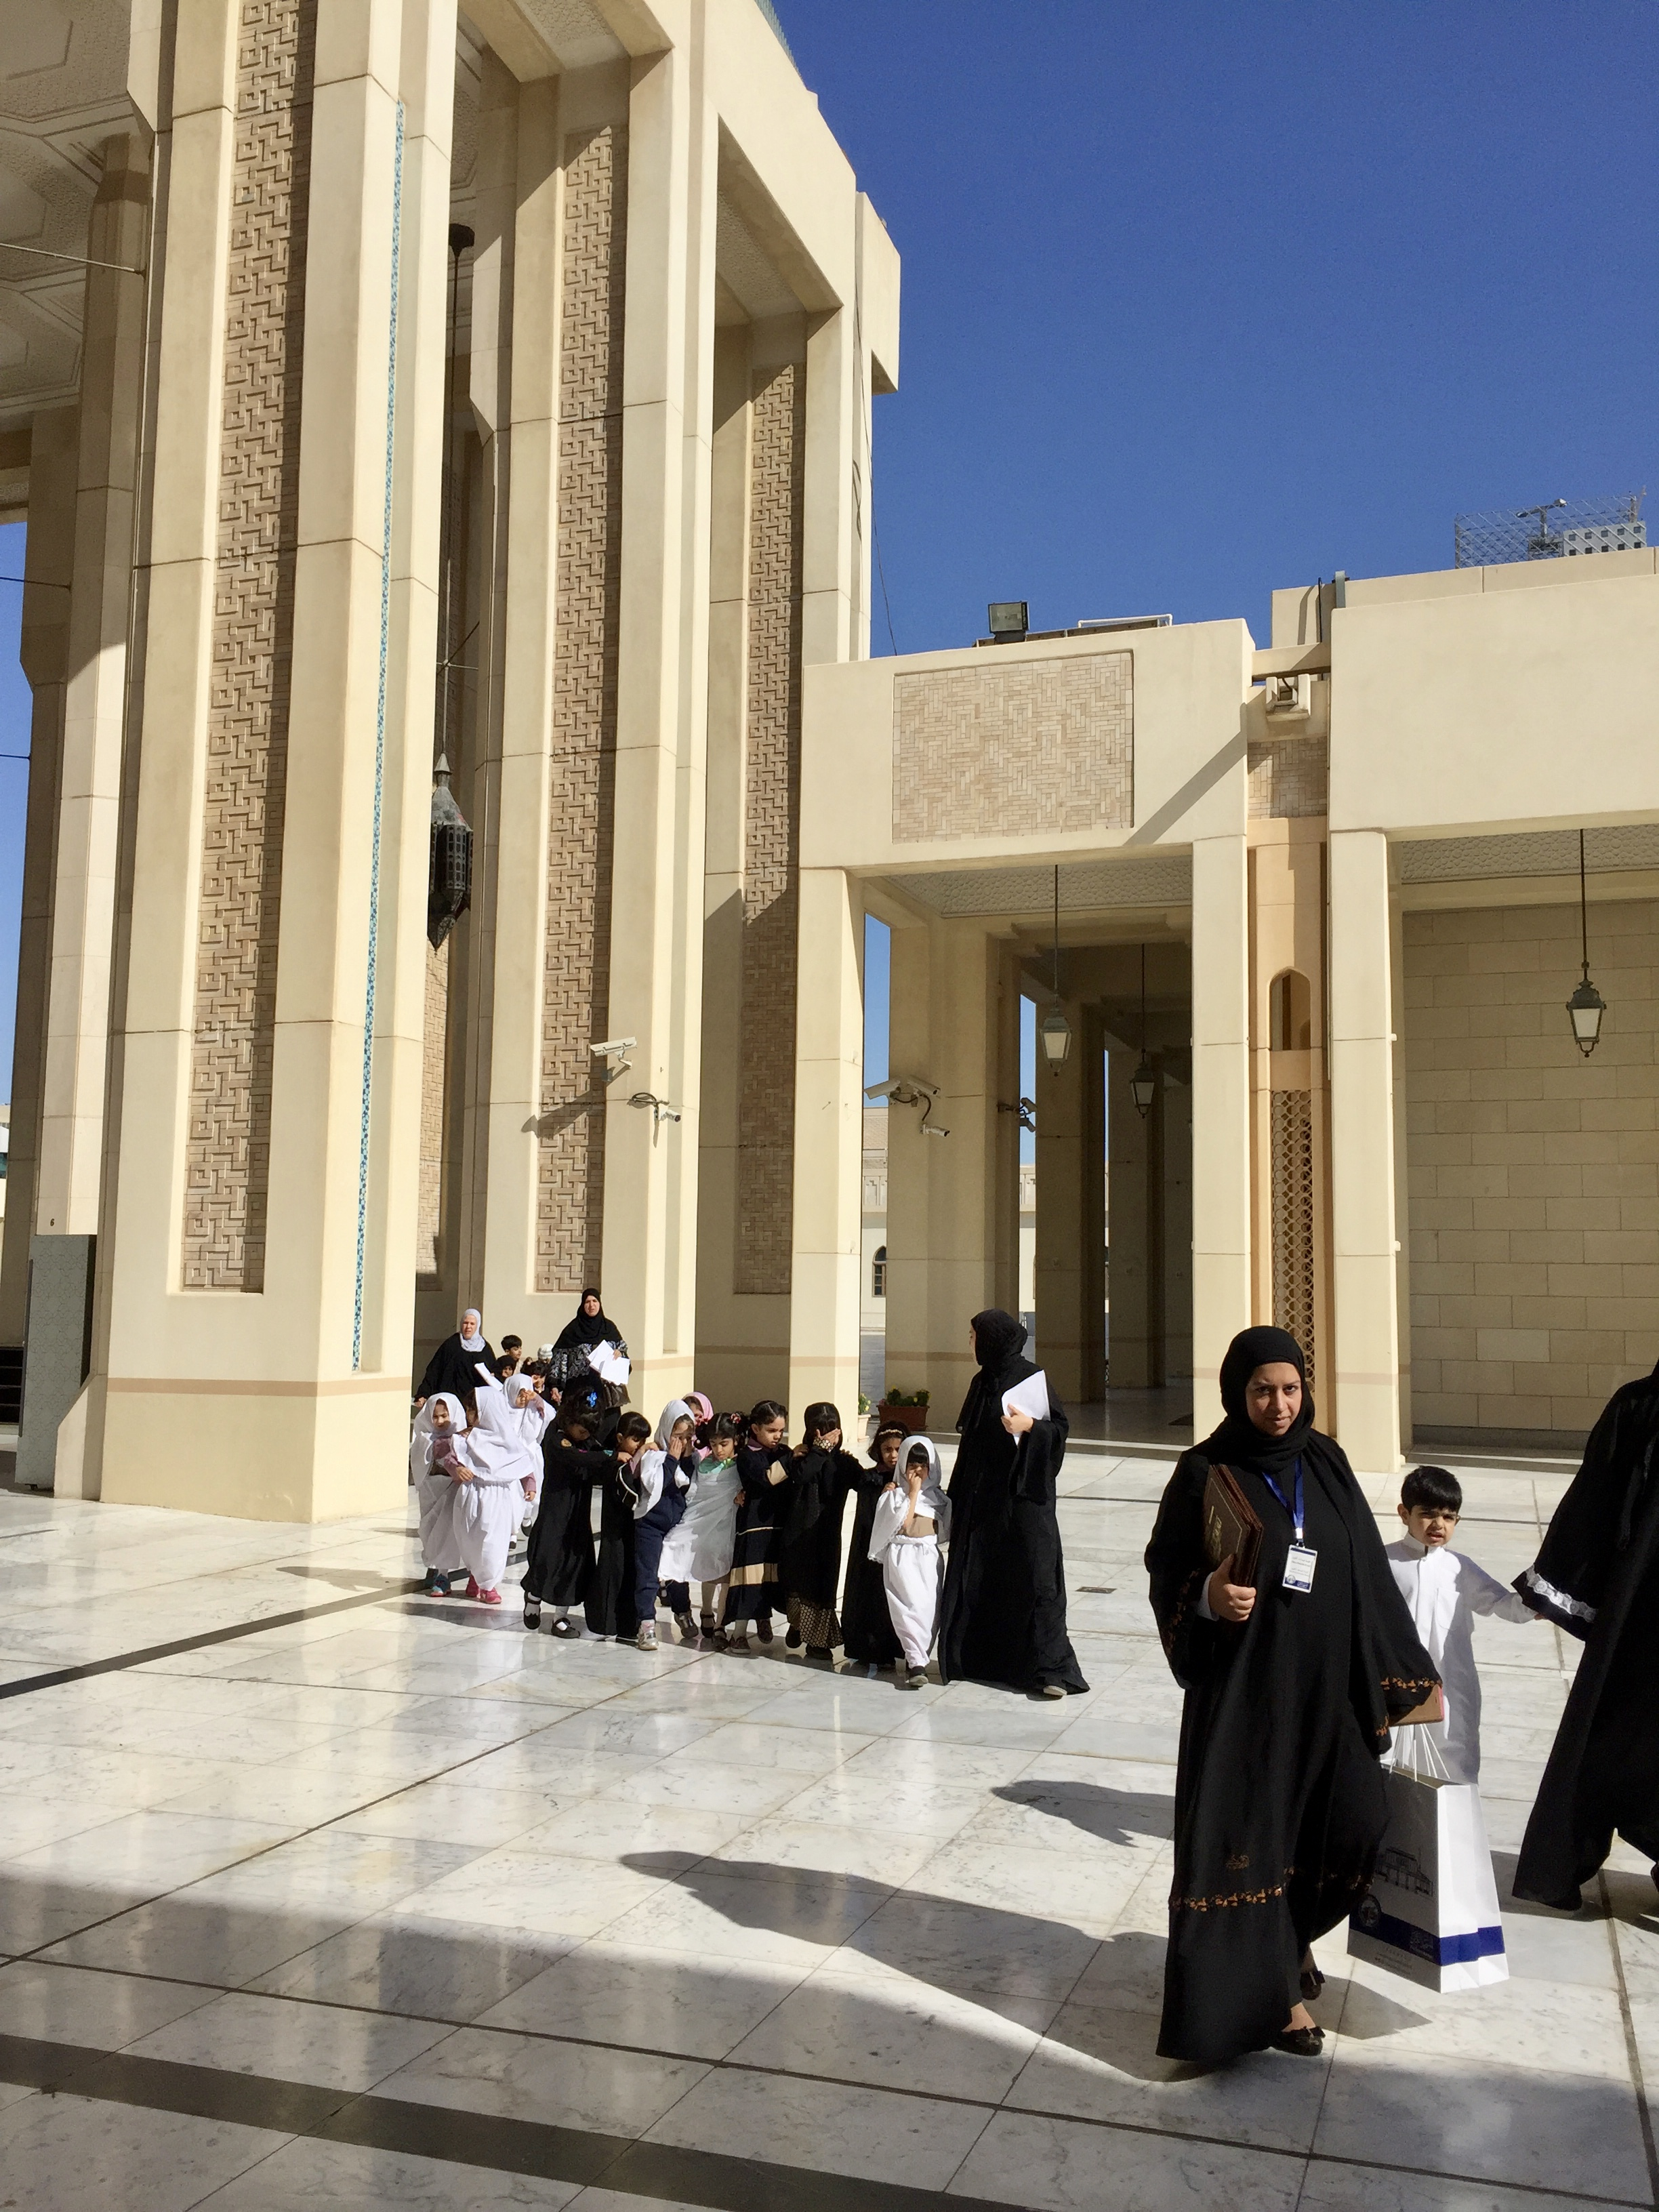 Kuwait City, Kuwait - Grand Mosque of Kuwait - School children on tour of the mosque